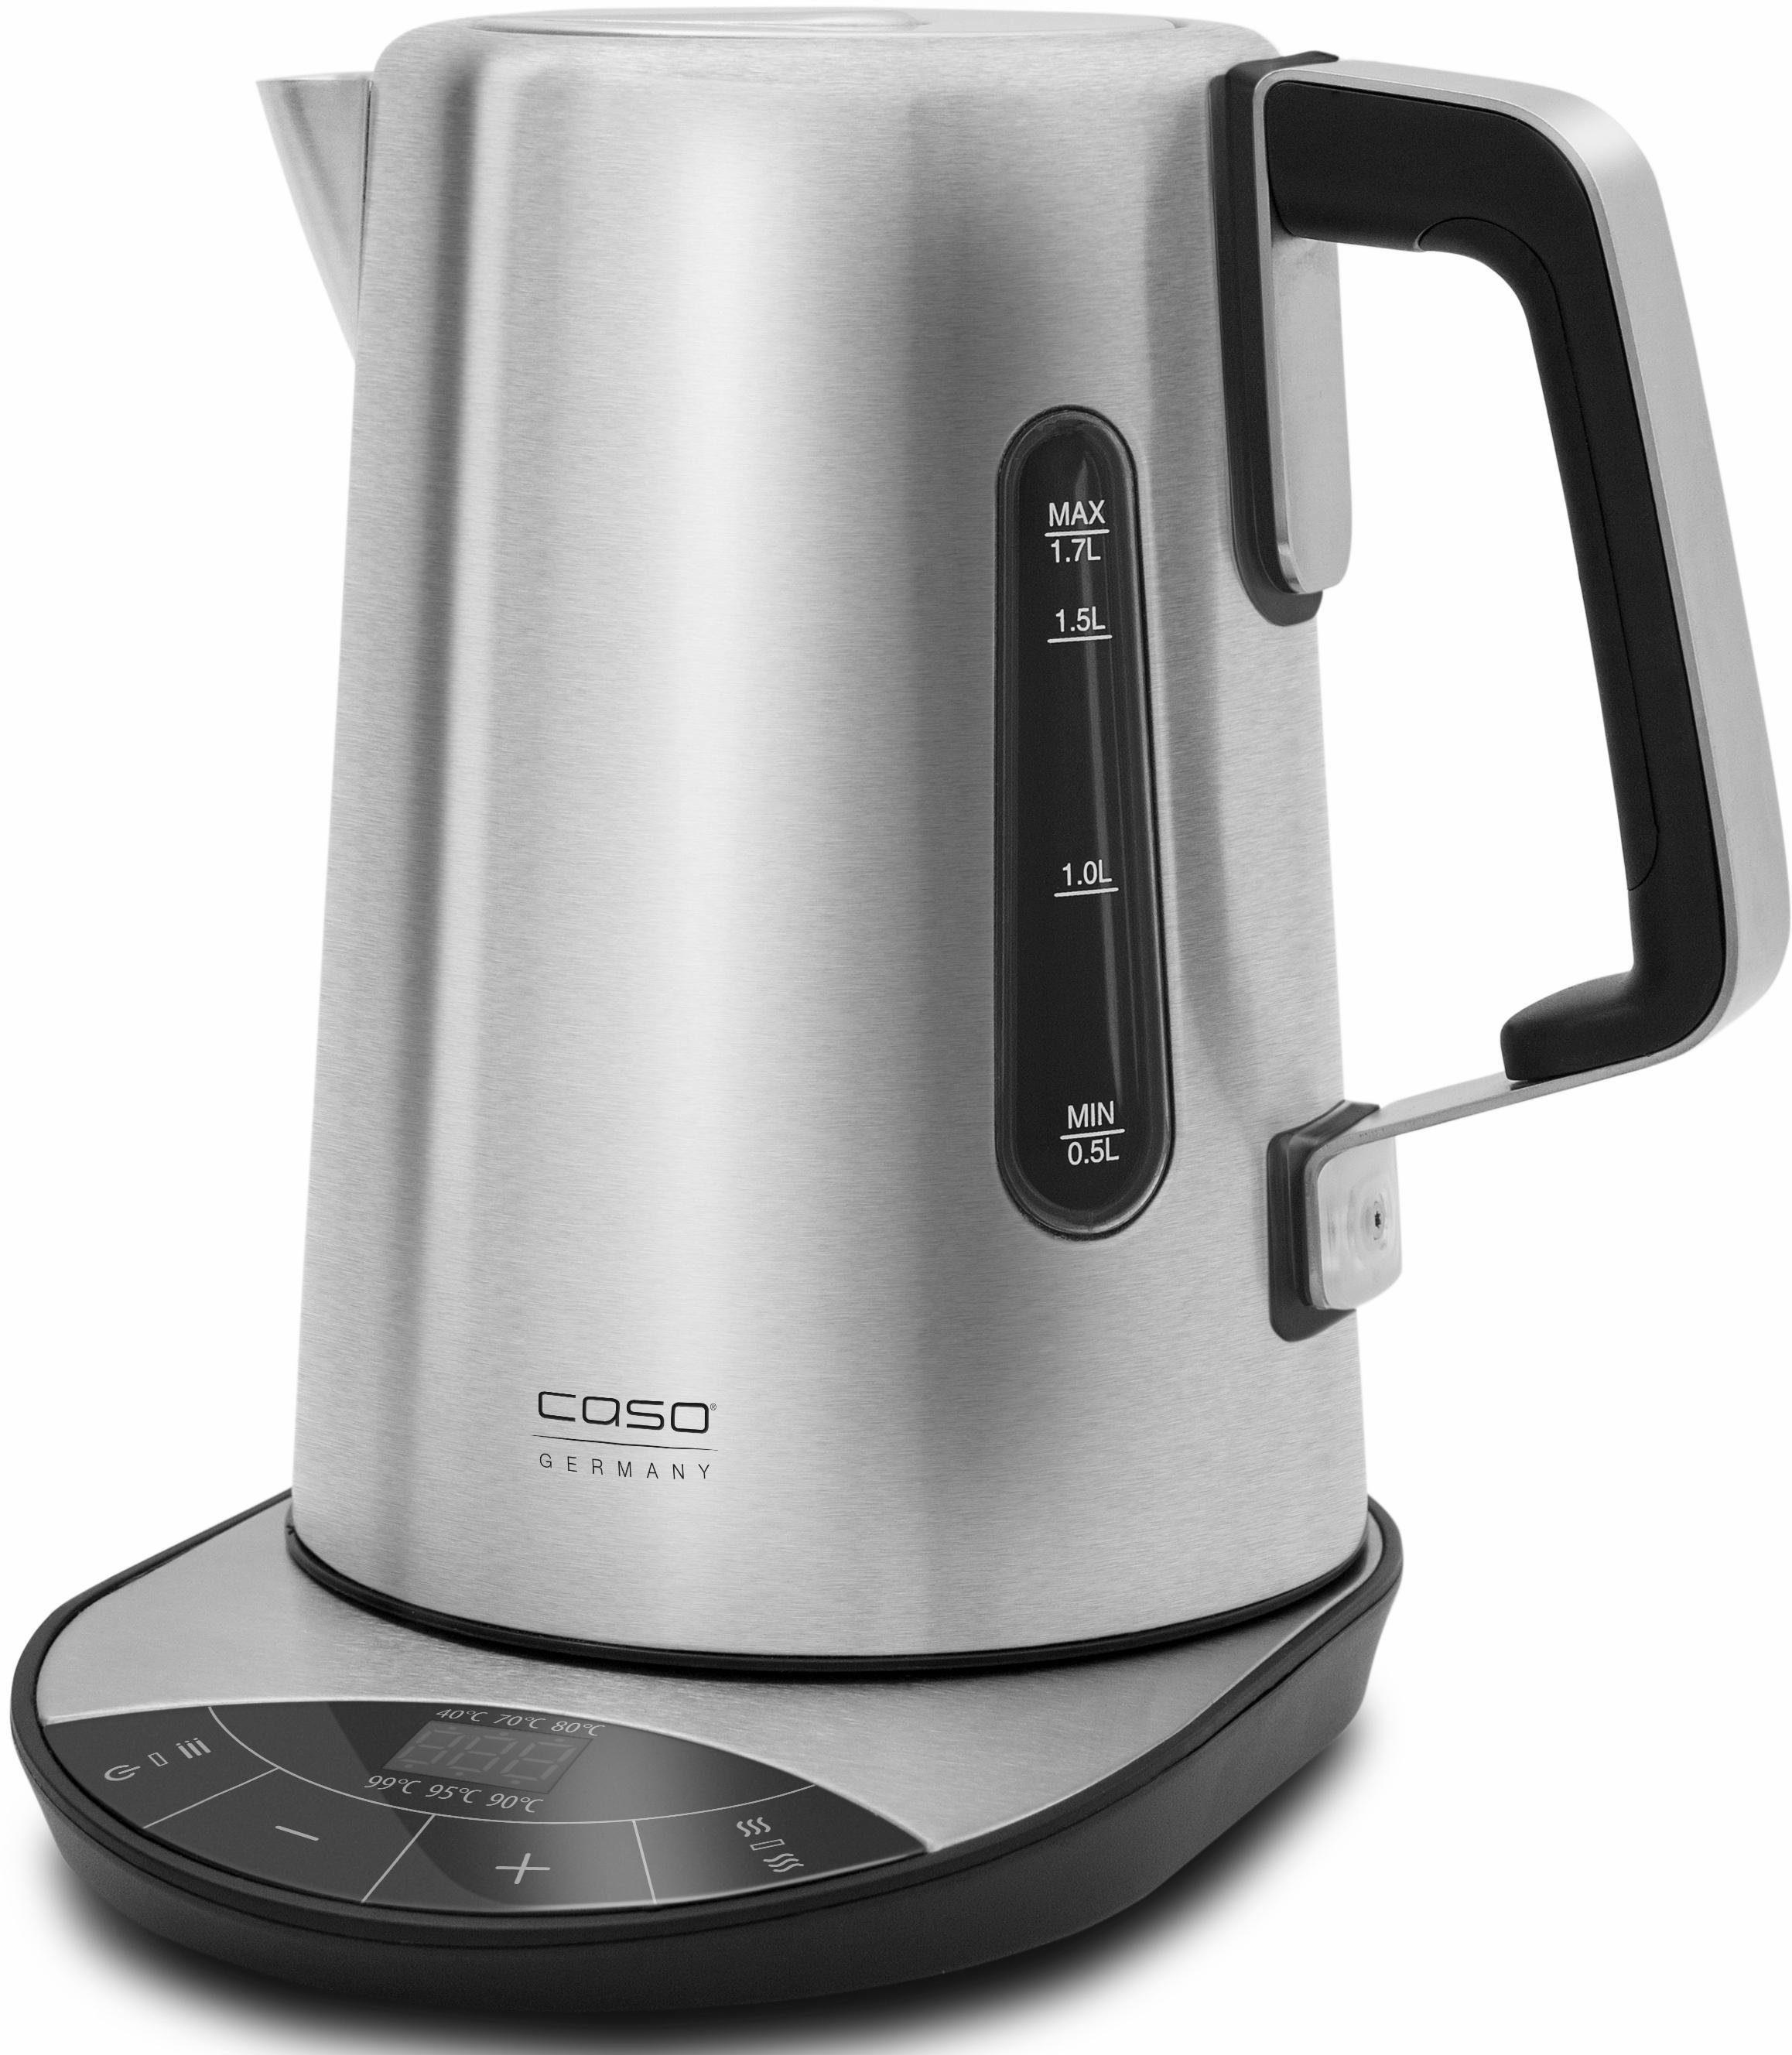 CASO Design Wasserkocher CASO WK2500, 1,7 Liter, 2500 Watt